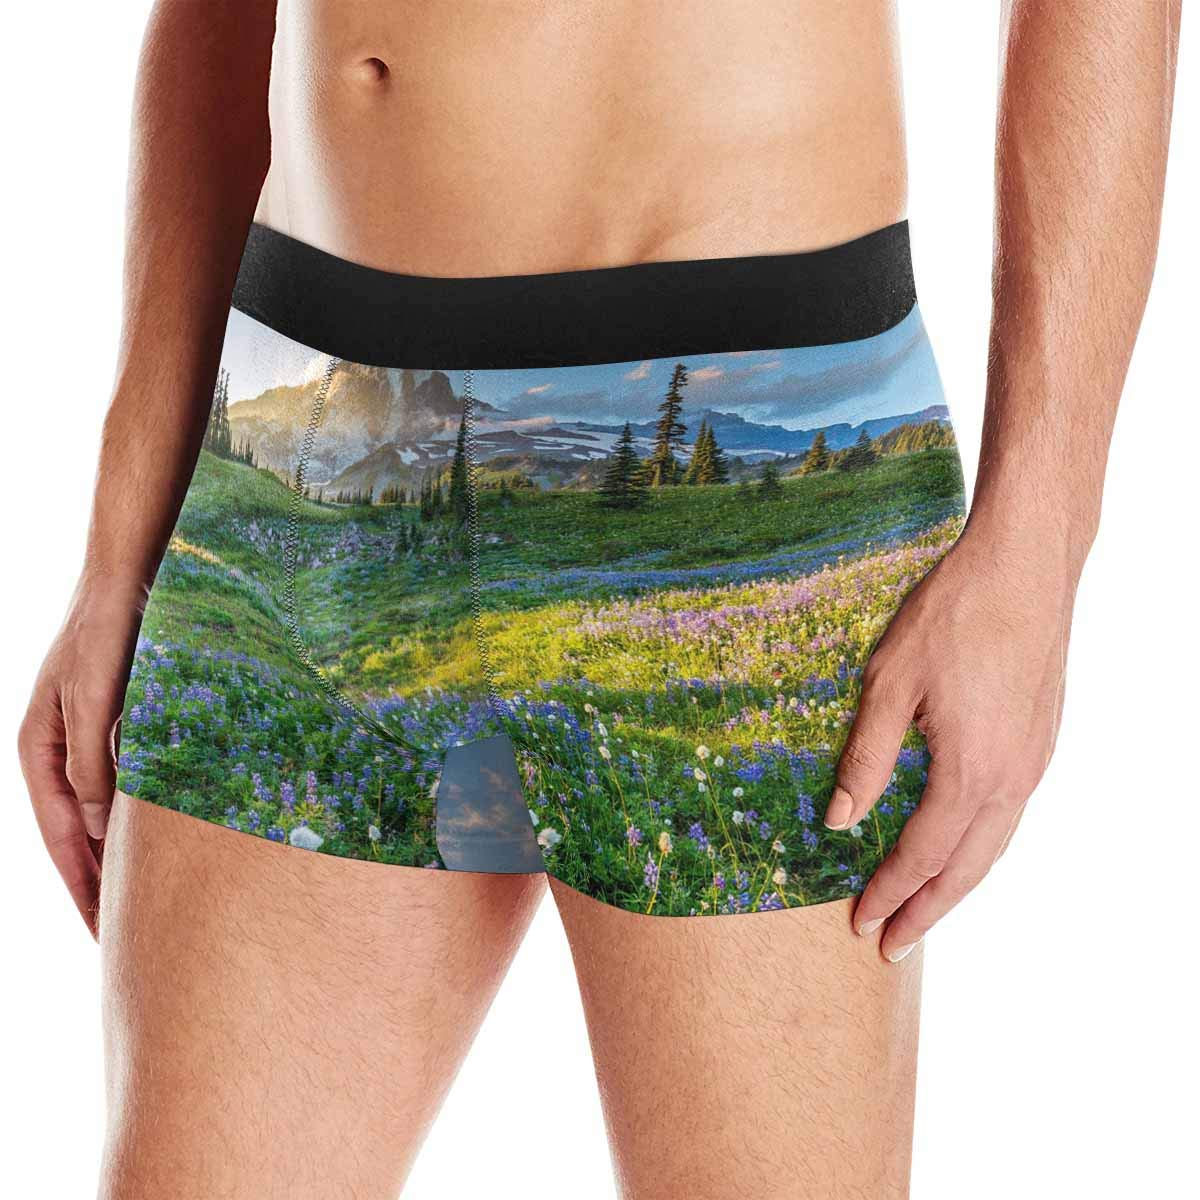 InterestPrint Mens Novelty Boxer Briefs Underpants Philippine Flowers Rainfores XS